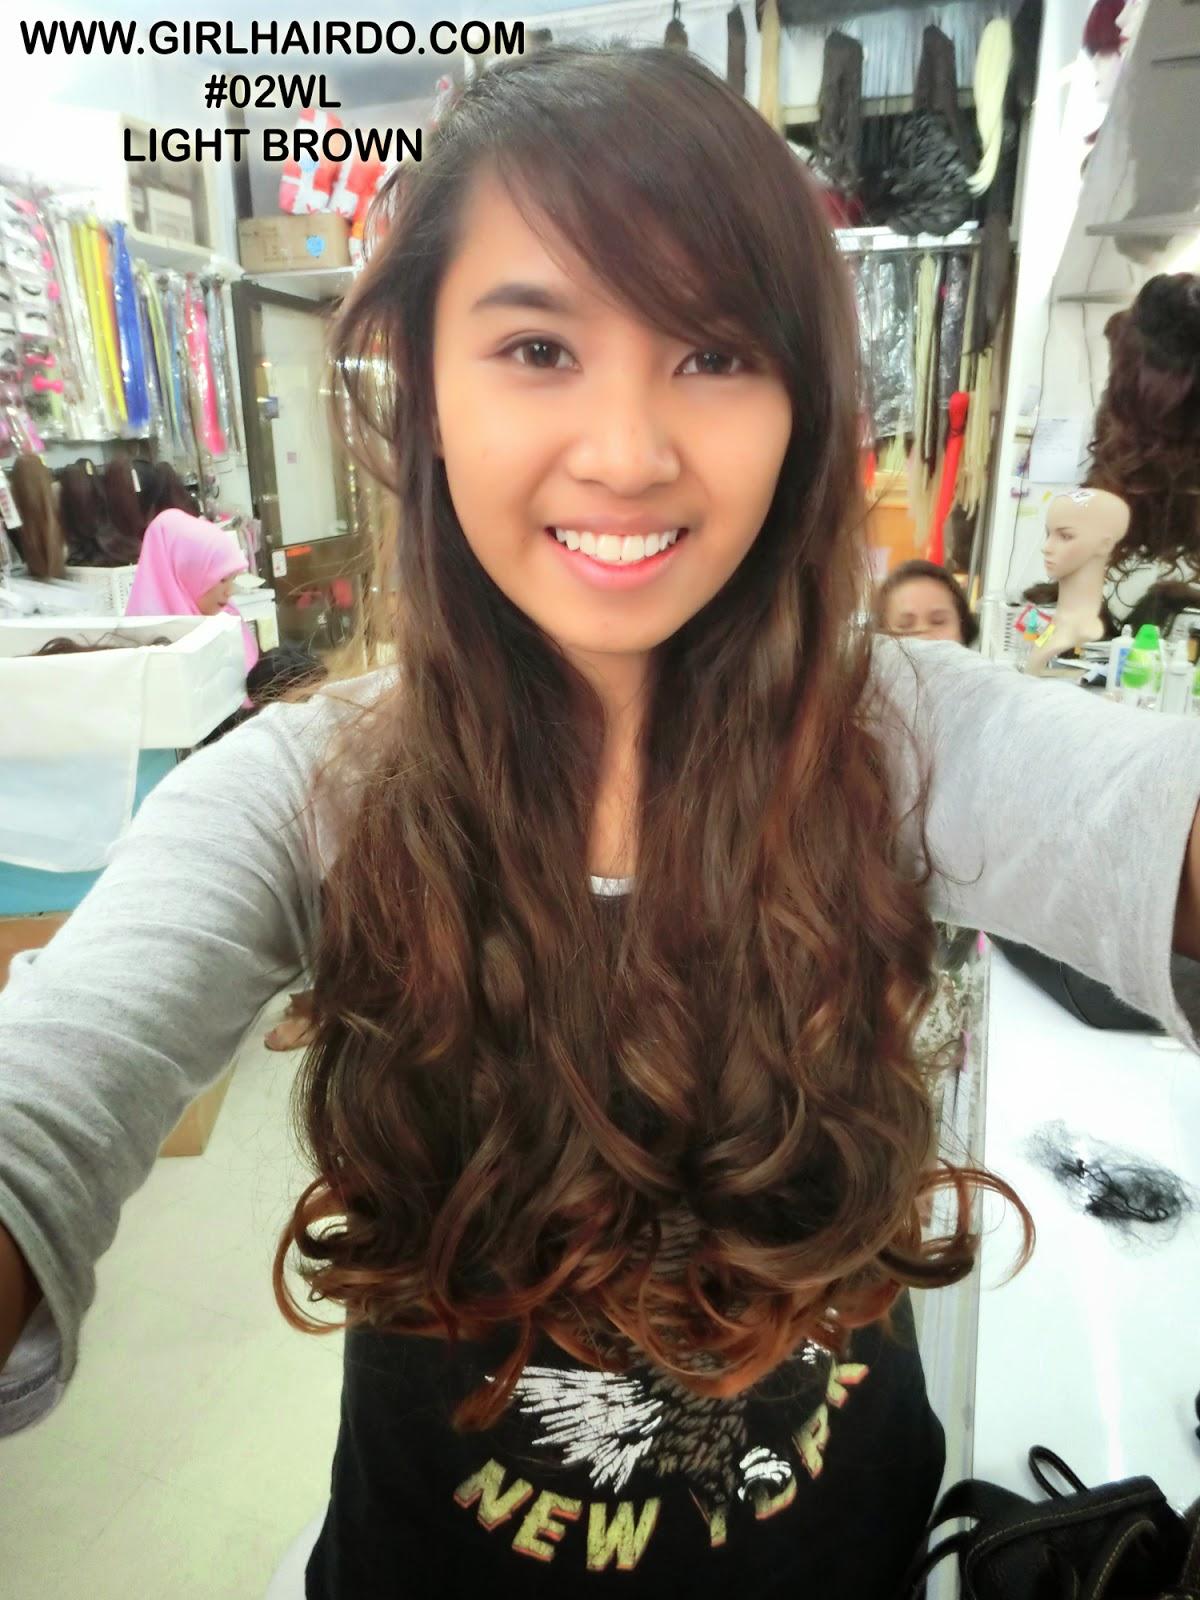 http://4.bp.blogspot.com/-O8JALv6ohes/U8_lnsvz_dI/AAAAAAAATGE/MwP4Ok3Z9JQ/s1600/girlhairdo+hair+extensions+customer+wearing.JPG